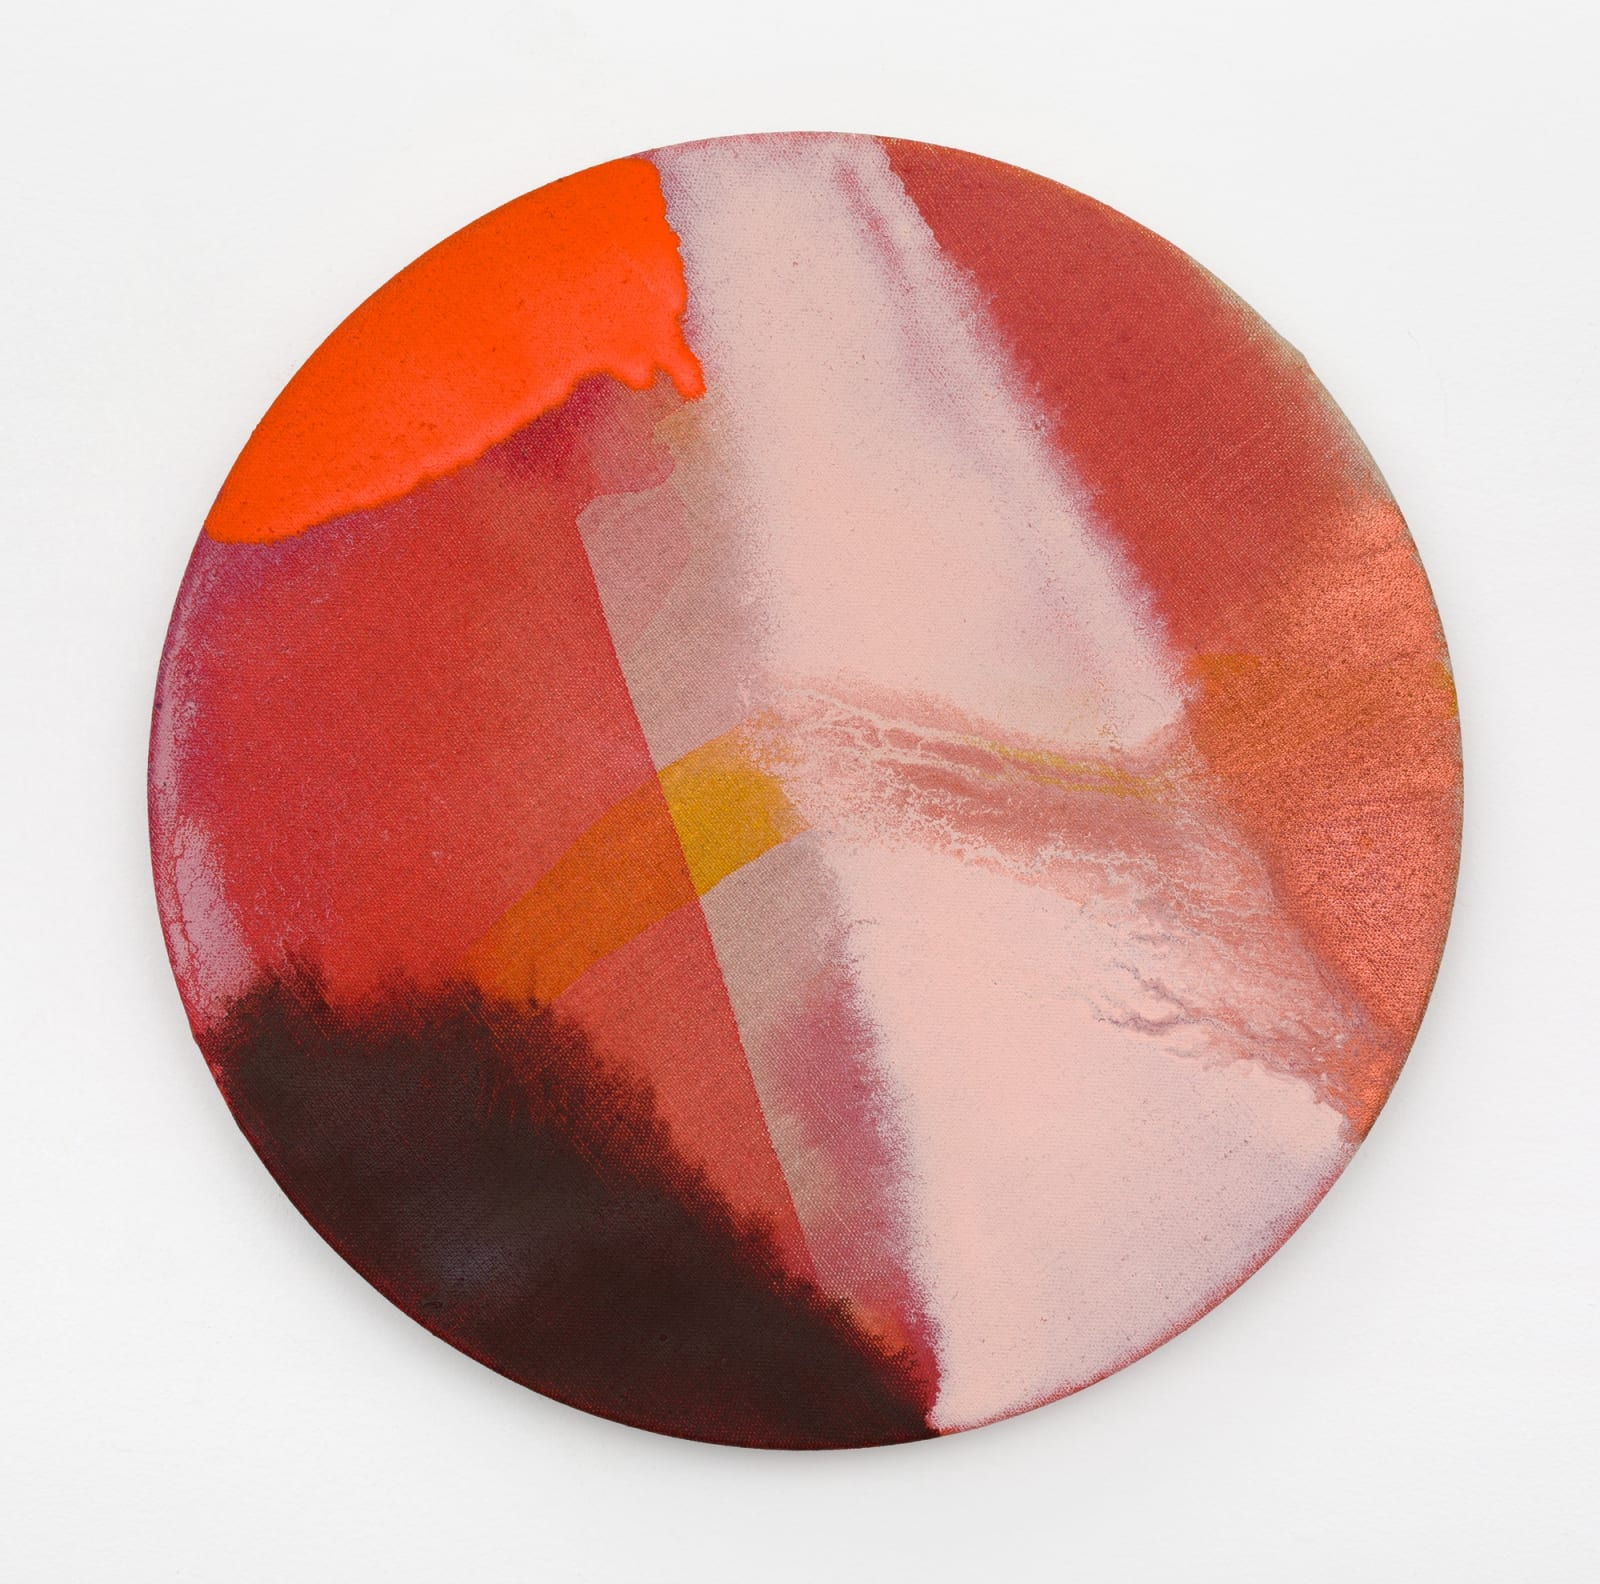 Pamela Jorden Interval (orange), 2020